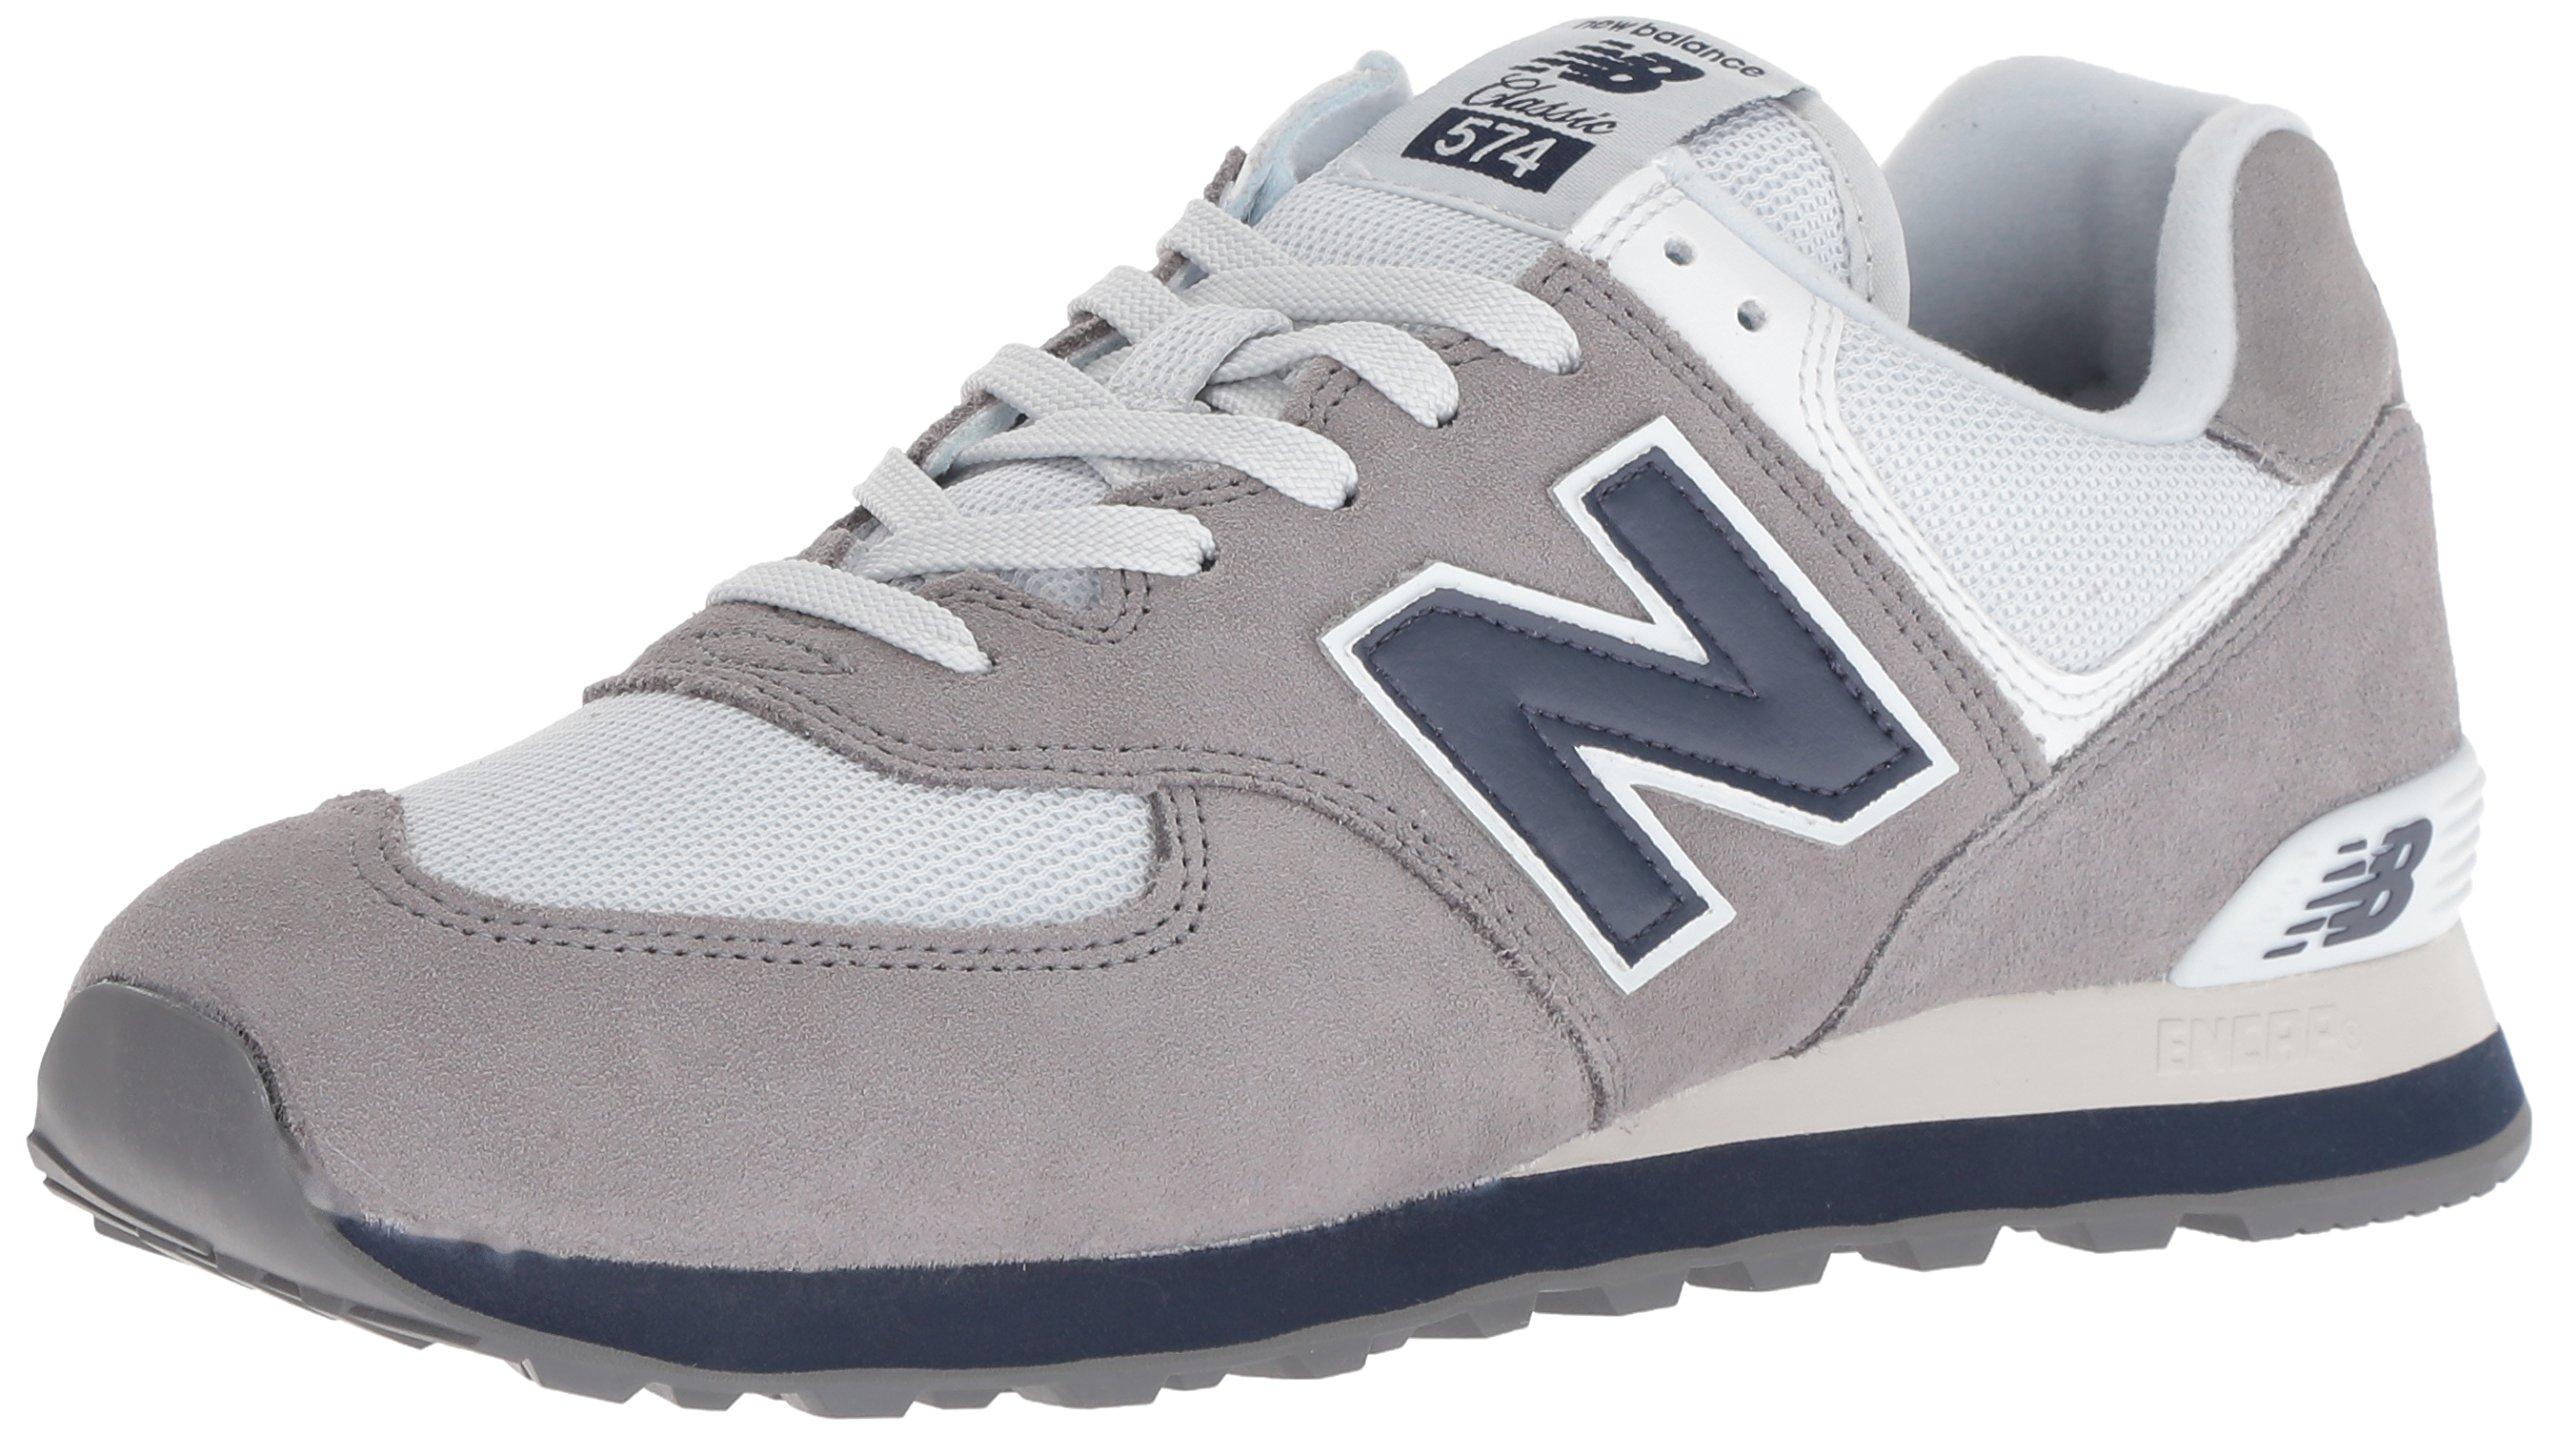 New Balance Men's 574S Sport Sneaker,Gunmetal/Navy,11.5 D US by New Balance